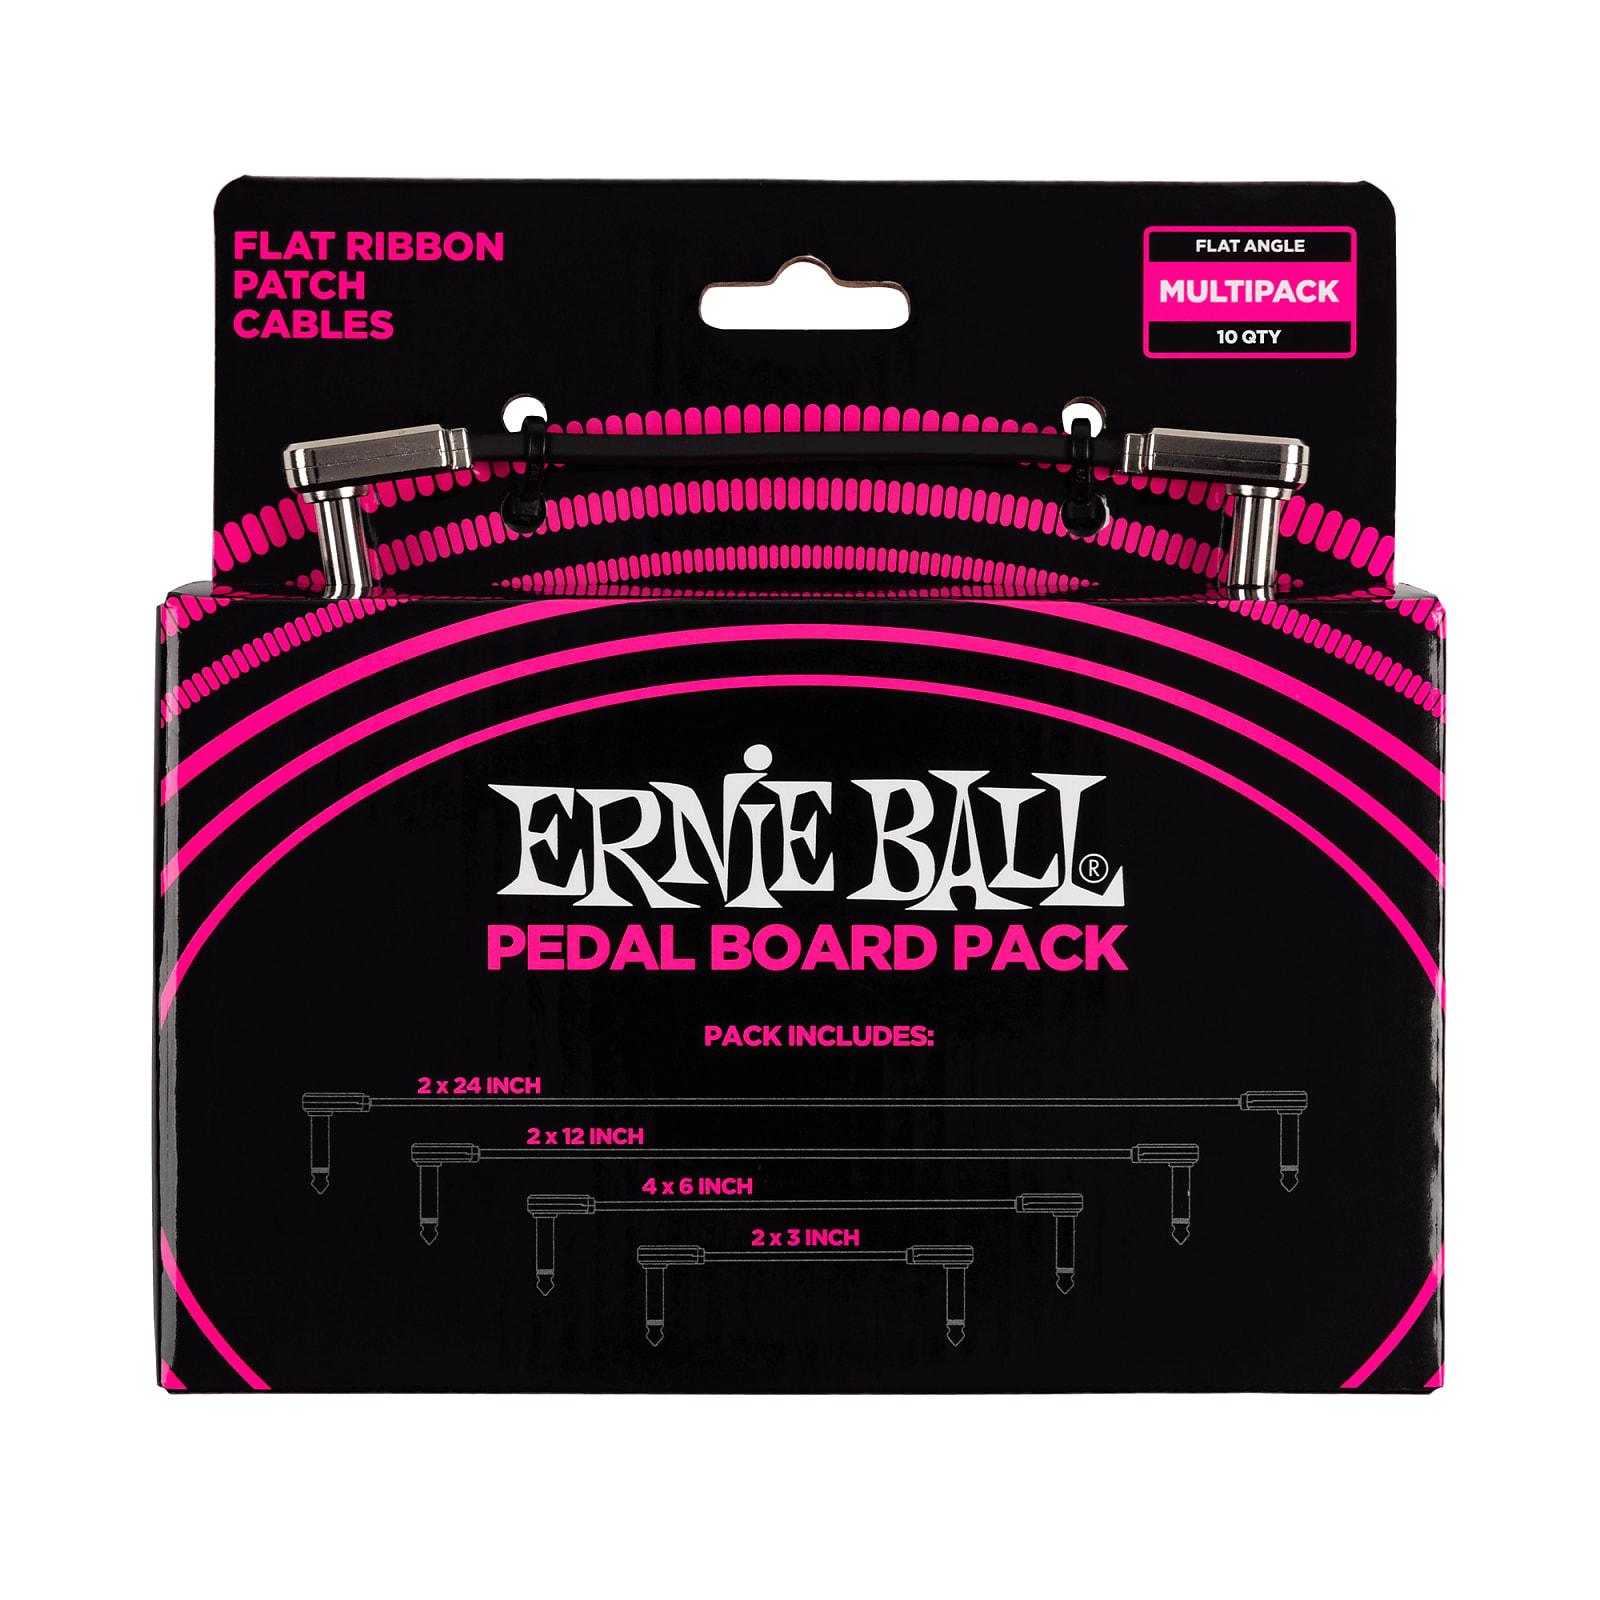 "Ernie Ball Flat Ribbon Patch Cables Pedalboard Multi-Pack (2x 24"" 2x 12"" + 4x 6"" + 2x 3"")"